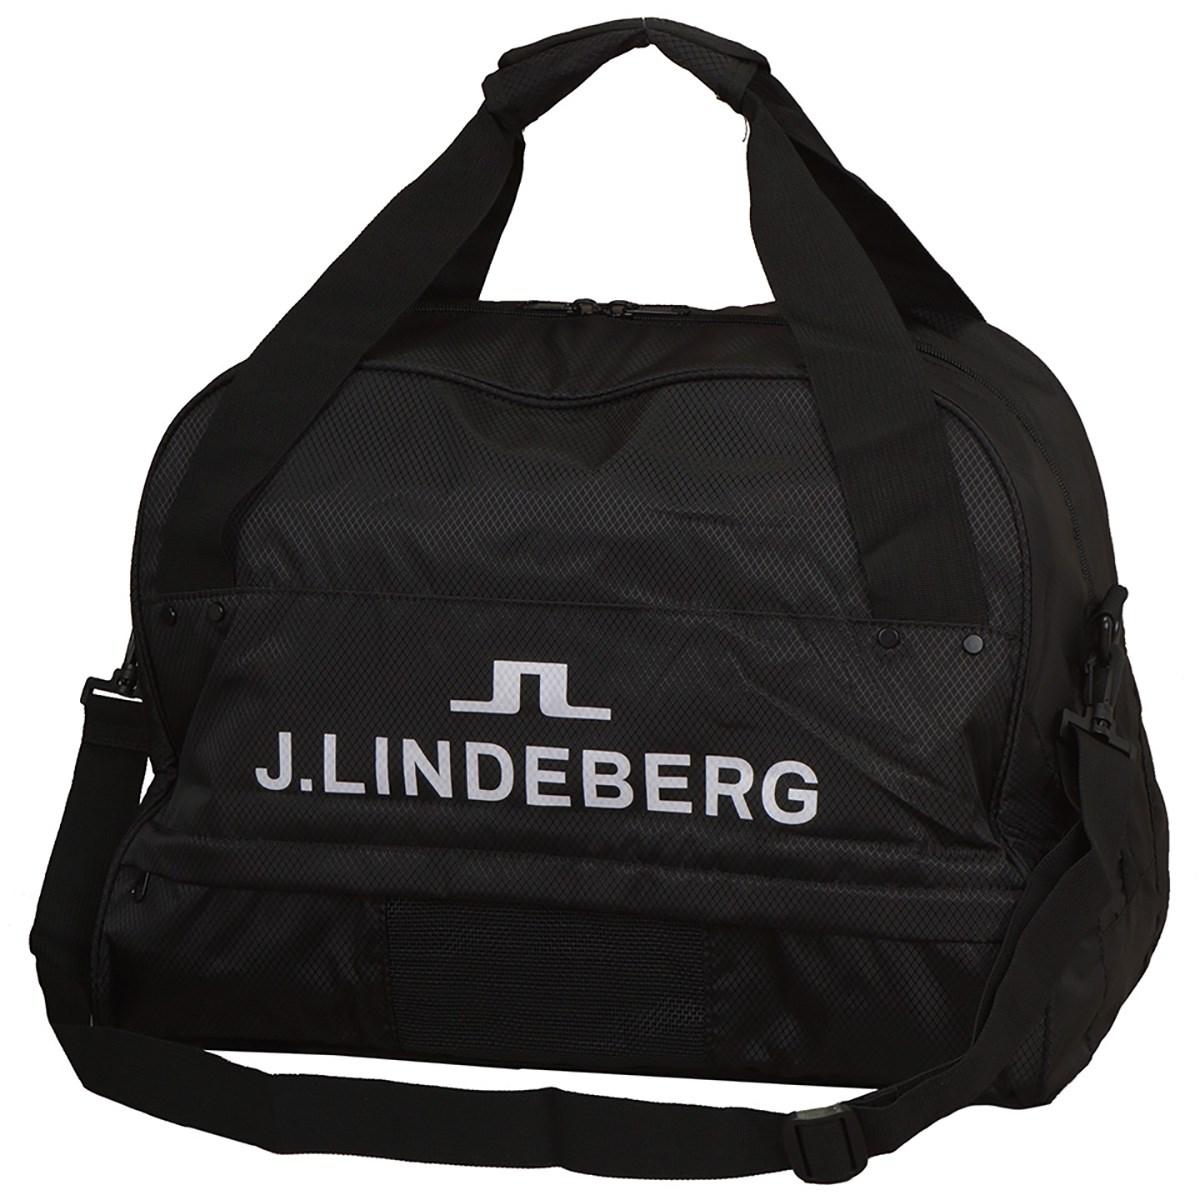 J.リンドバーグ 軽量ボストンバッグ